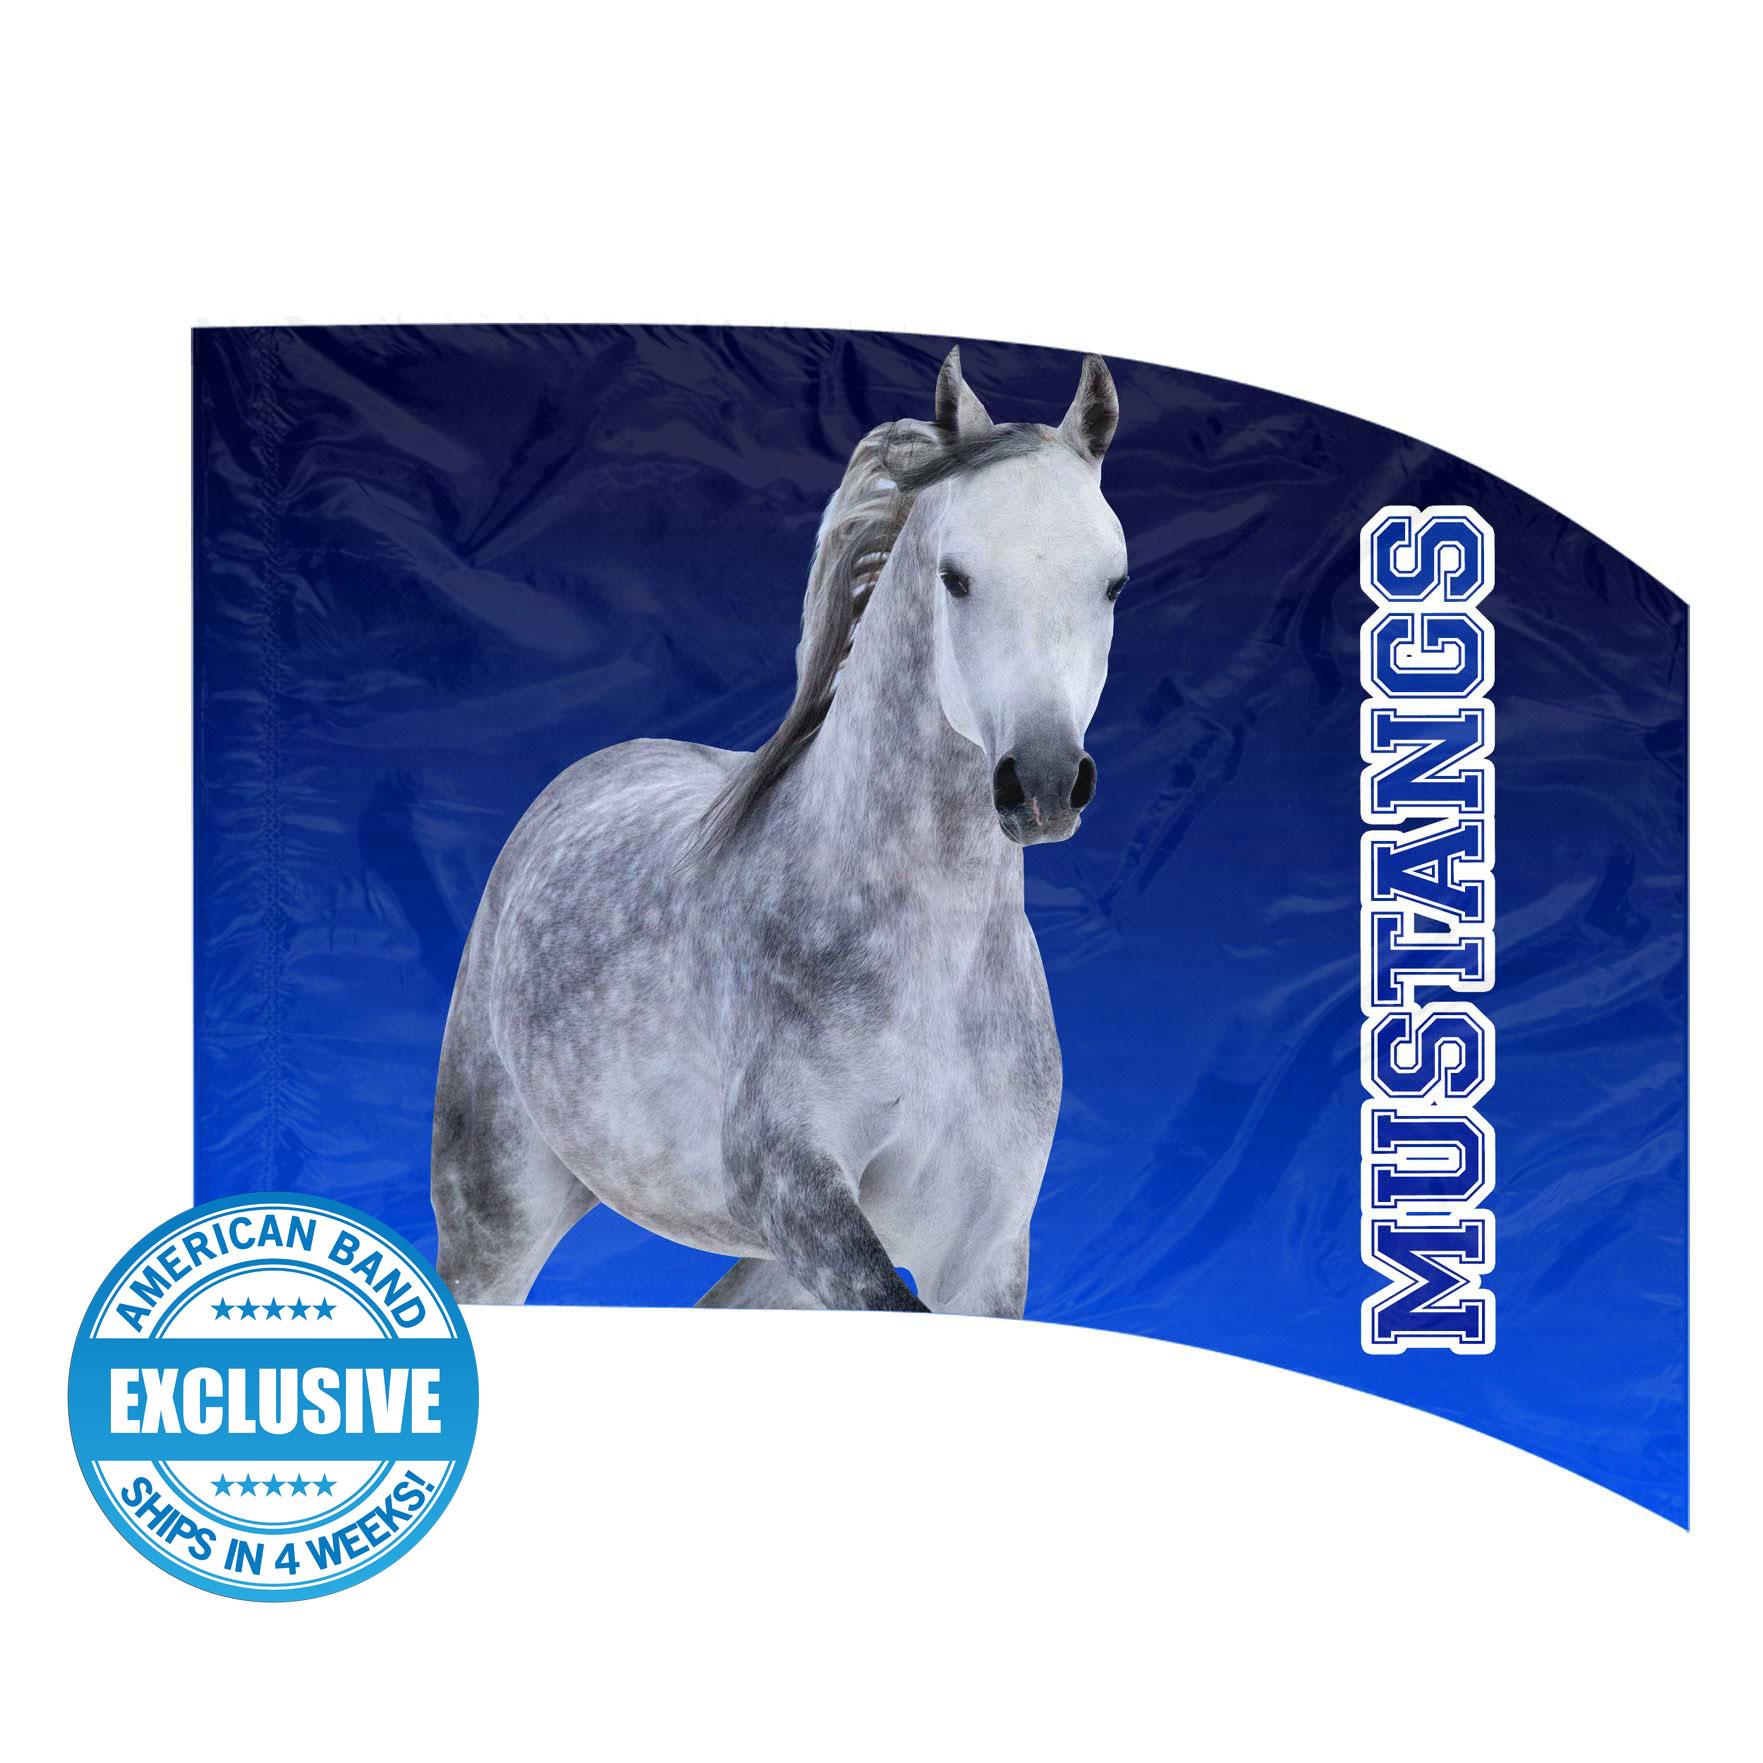 Made-to-Order Digital Mascot Flags - Mustang